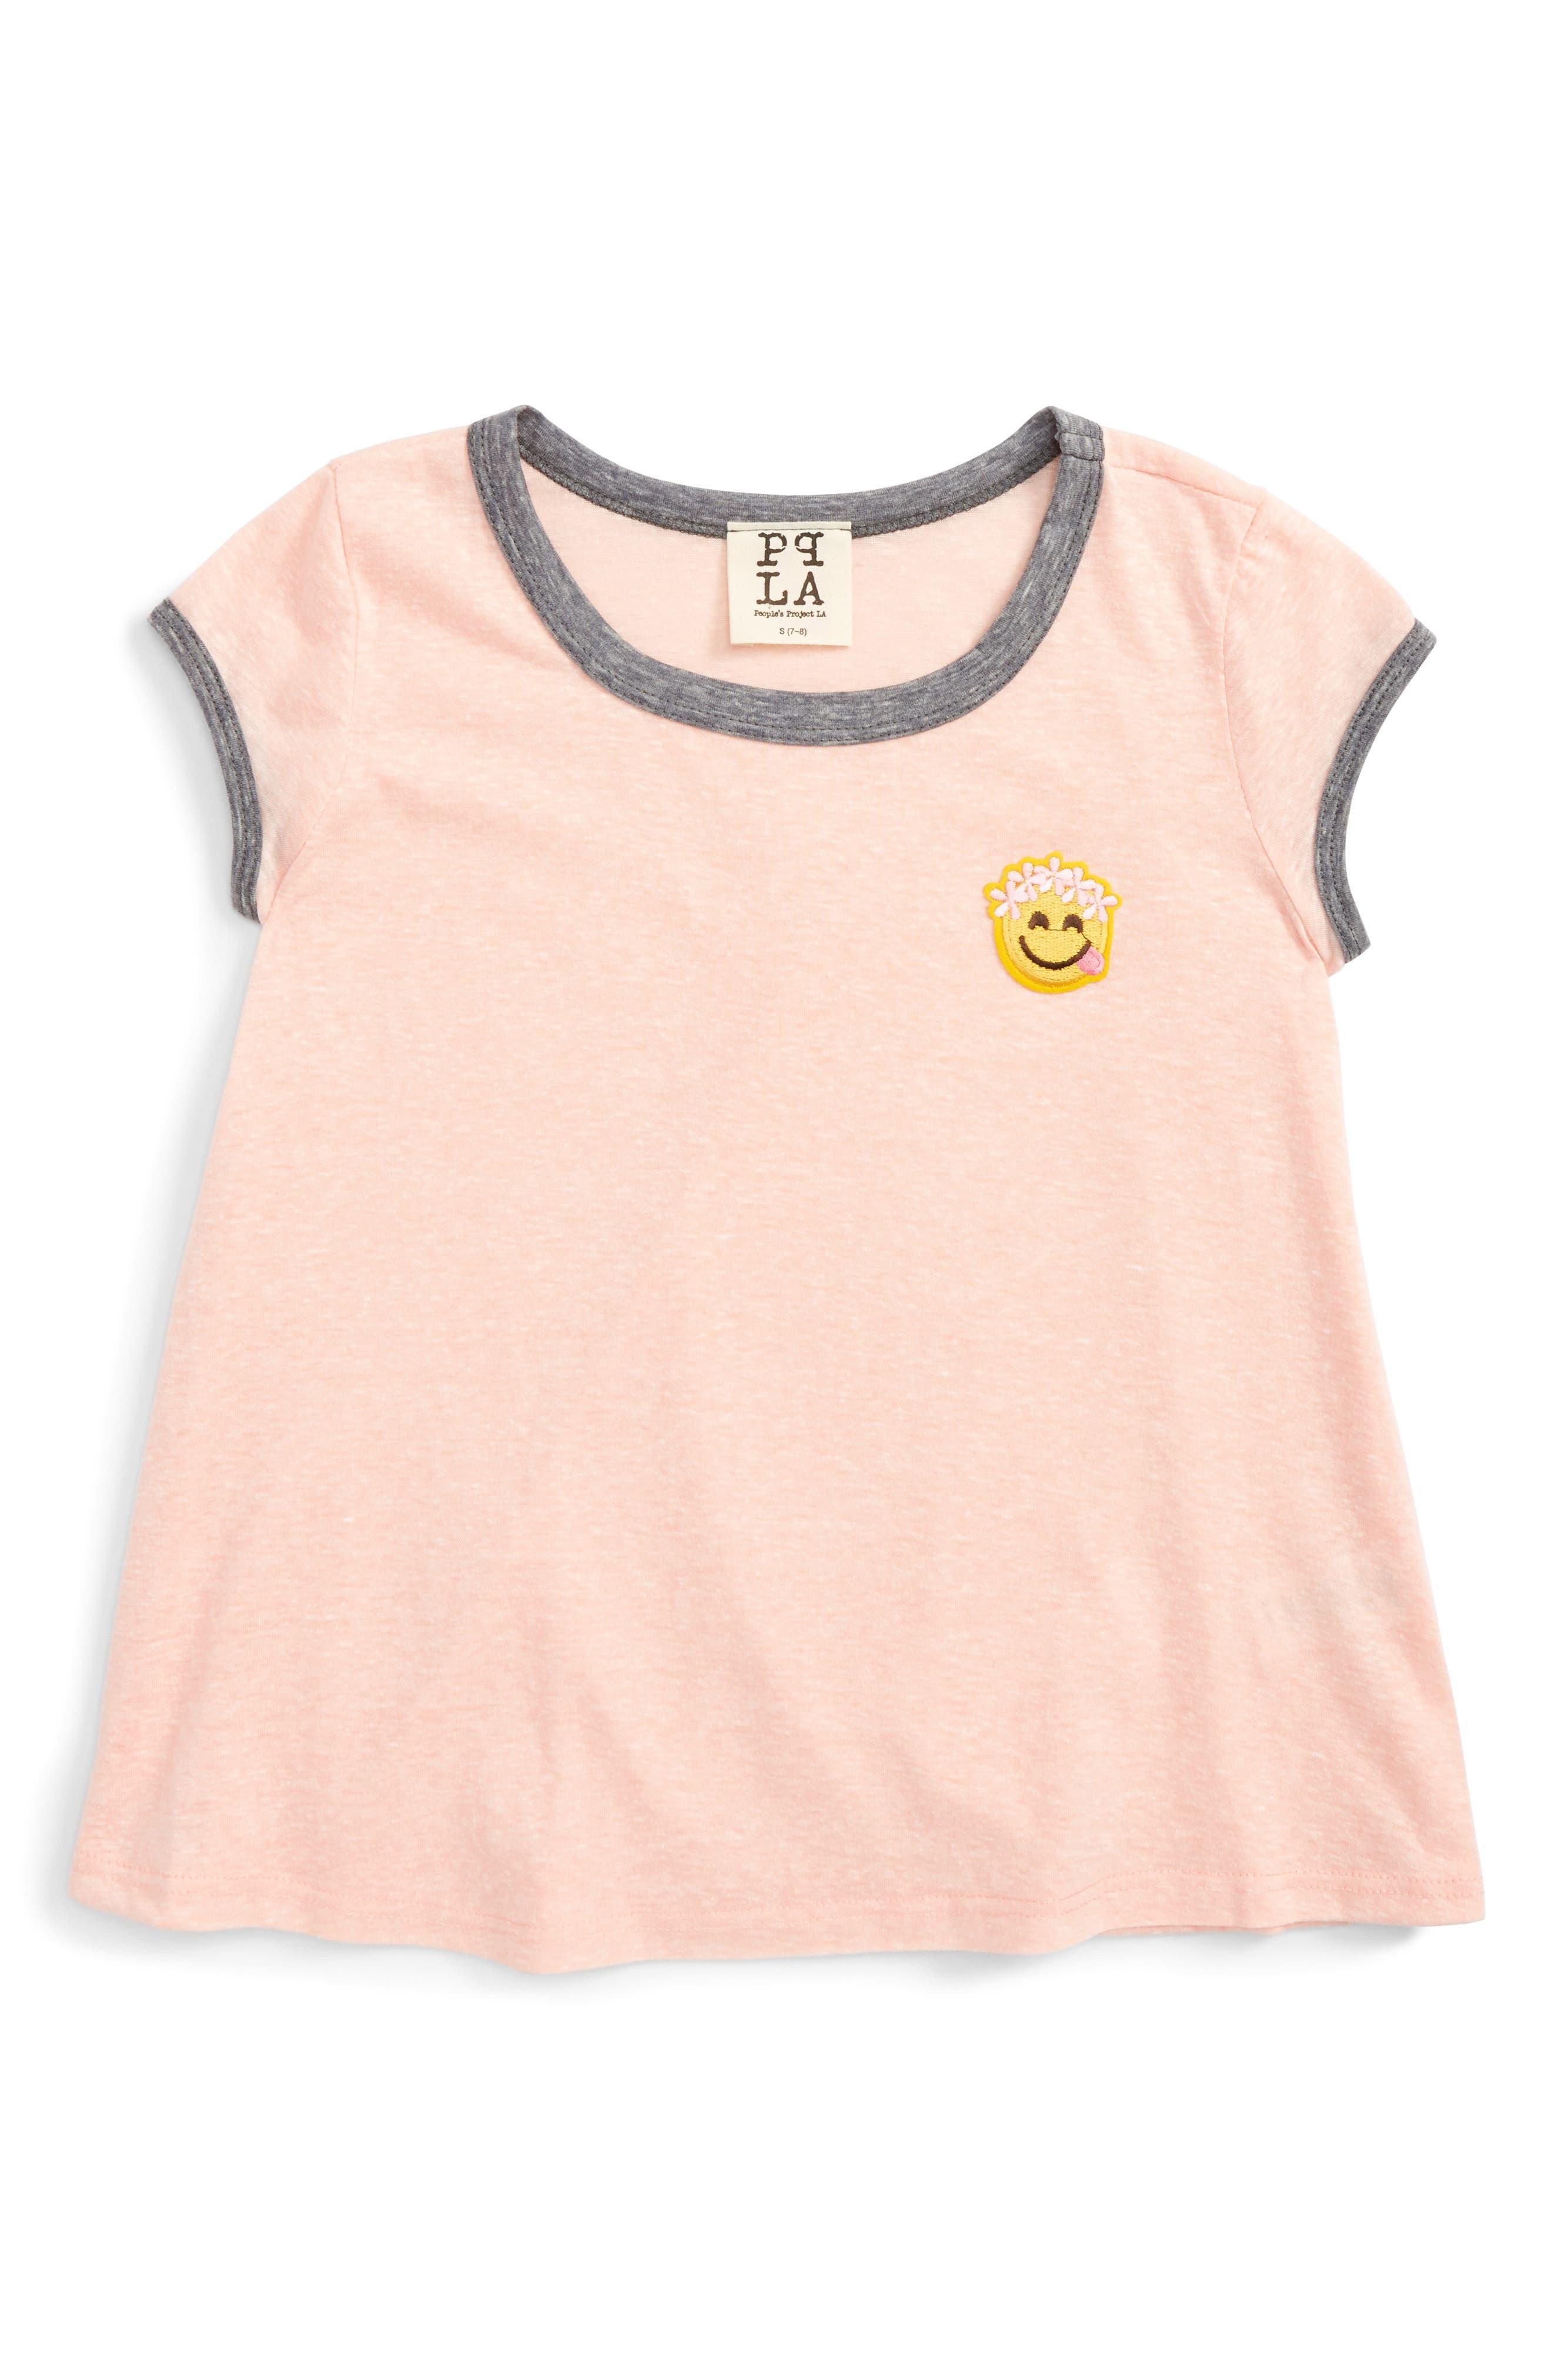 Main Image - PPLA Smiley Face Appliqué Tee (Big Girls)